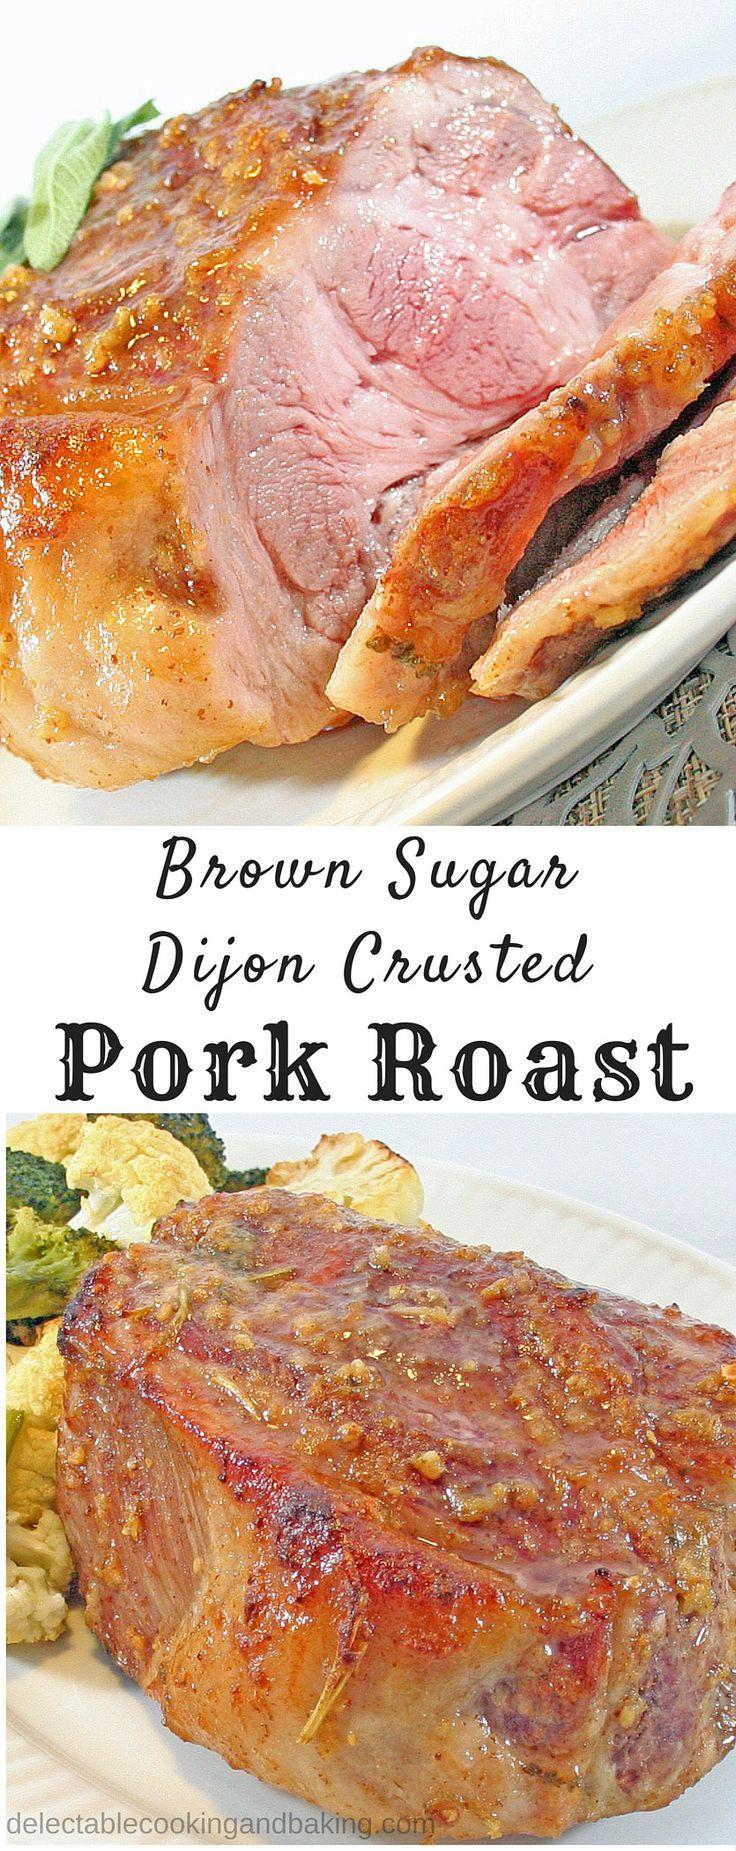 ... - roasts on Pinterest | Turkey recipes, Pork and Roast leg of lamb